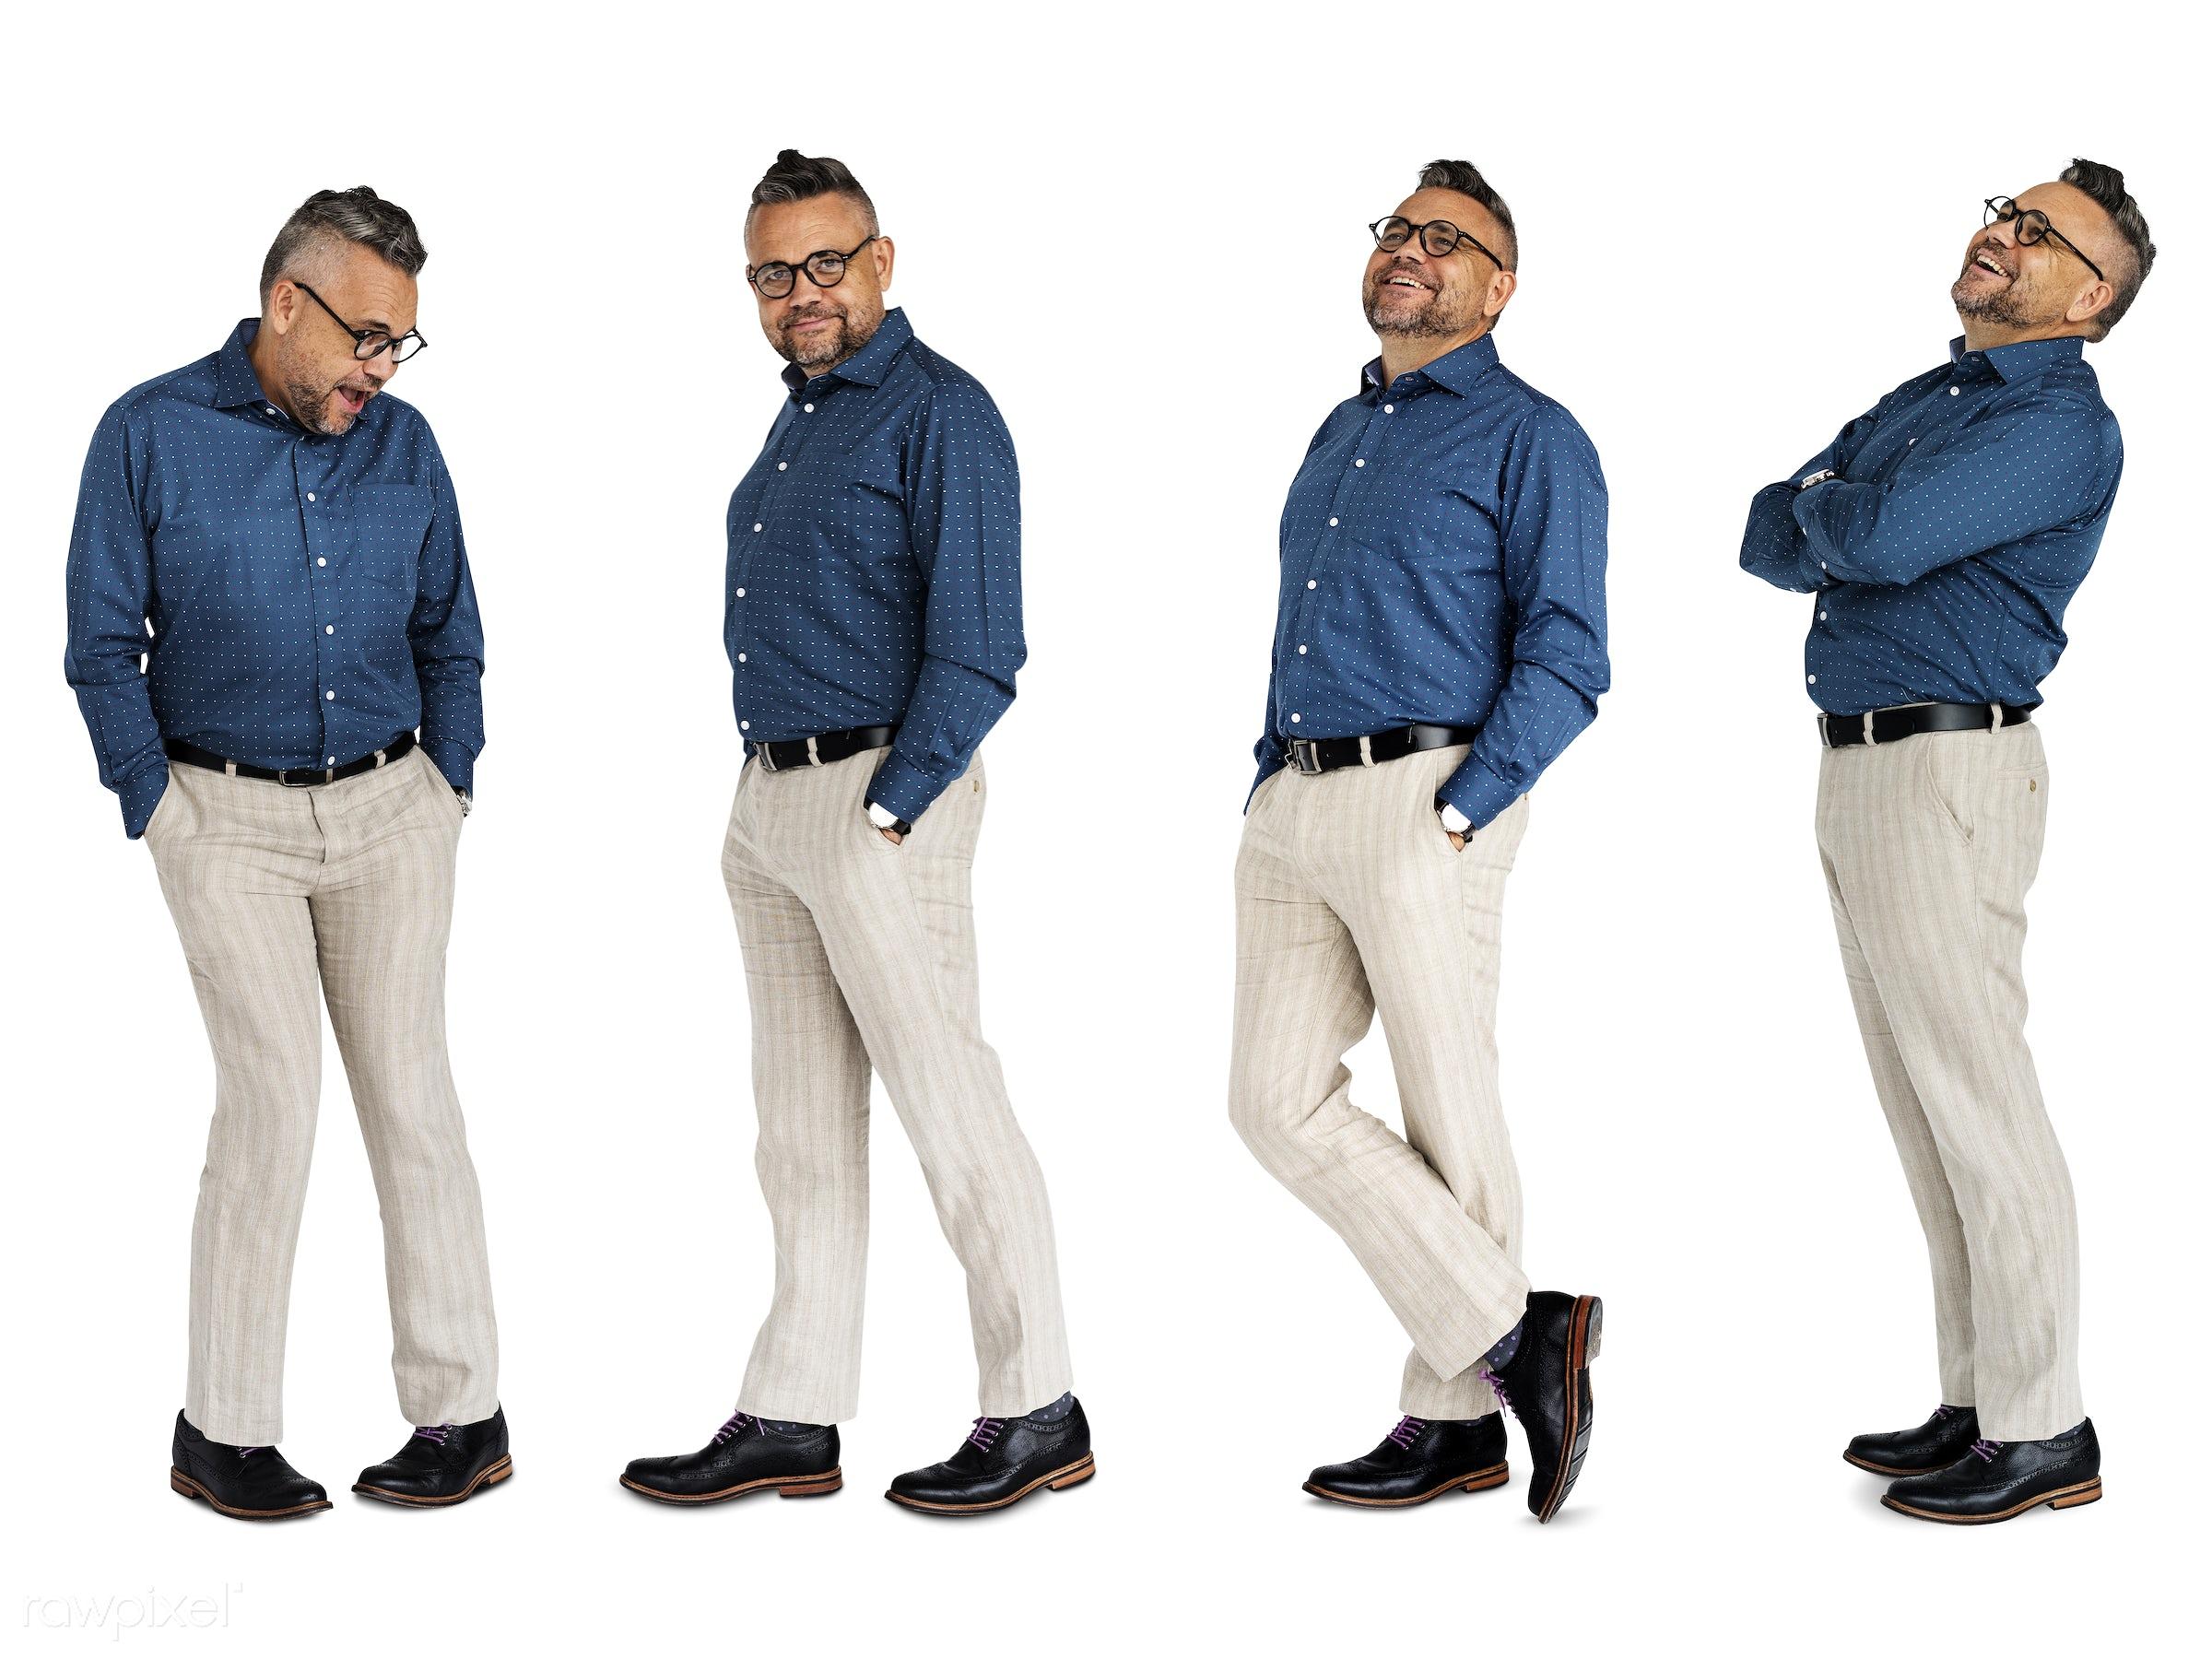 adult, attraction, attractive, casual, cheerful, collection, diverse, diversity, ethnicity, eyeglasses, gentlemen, gesture,...